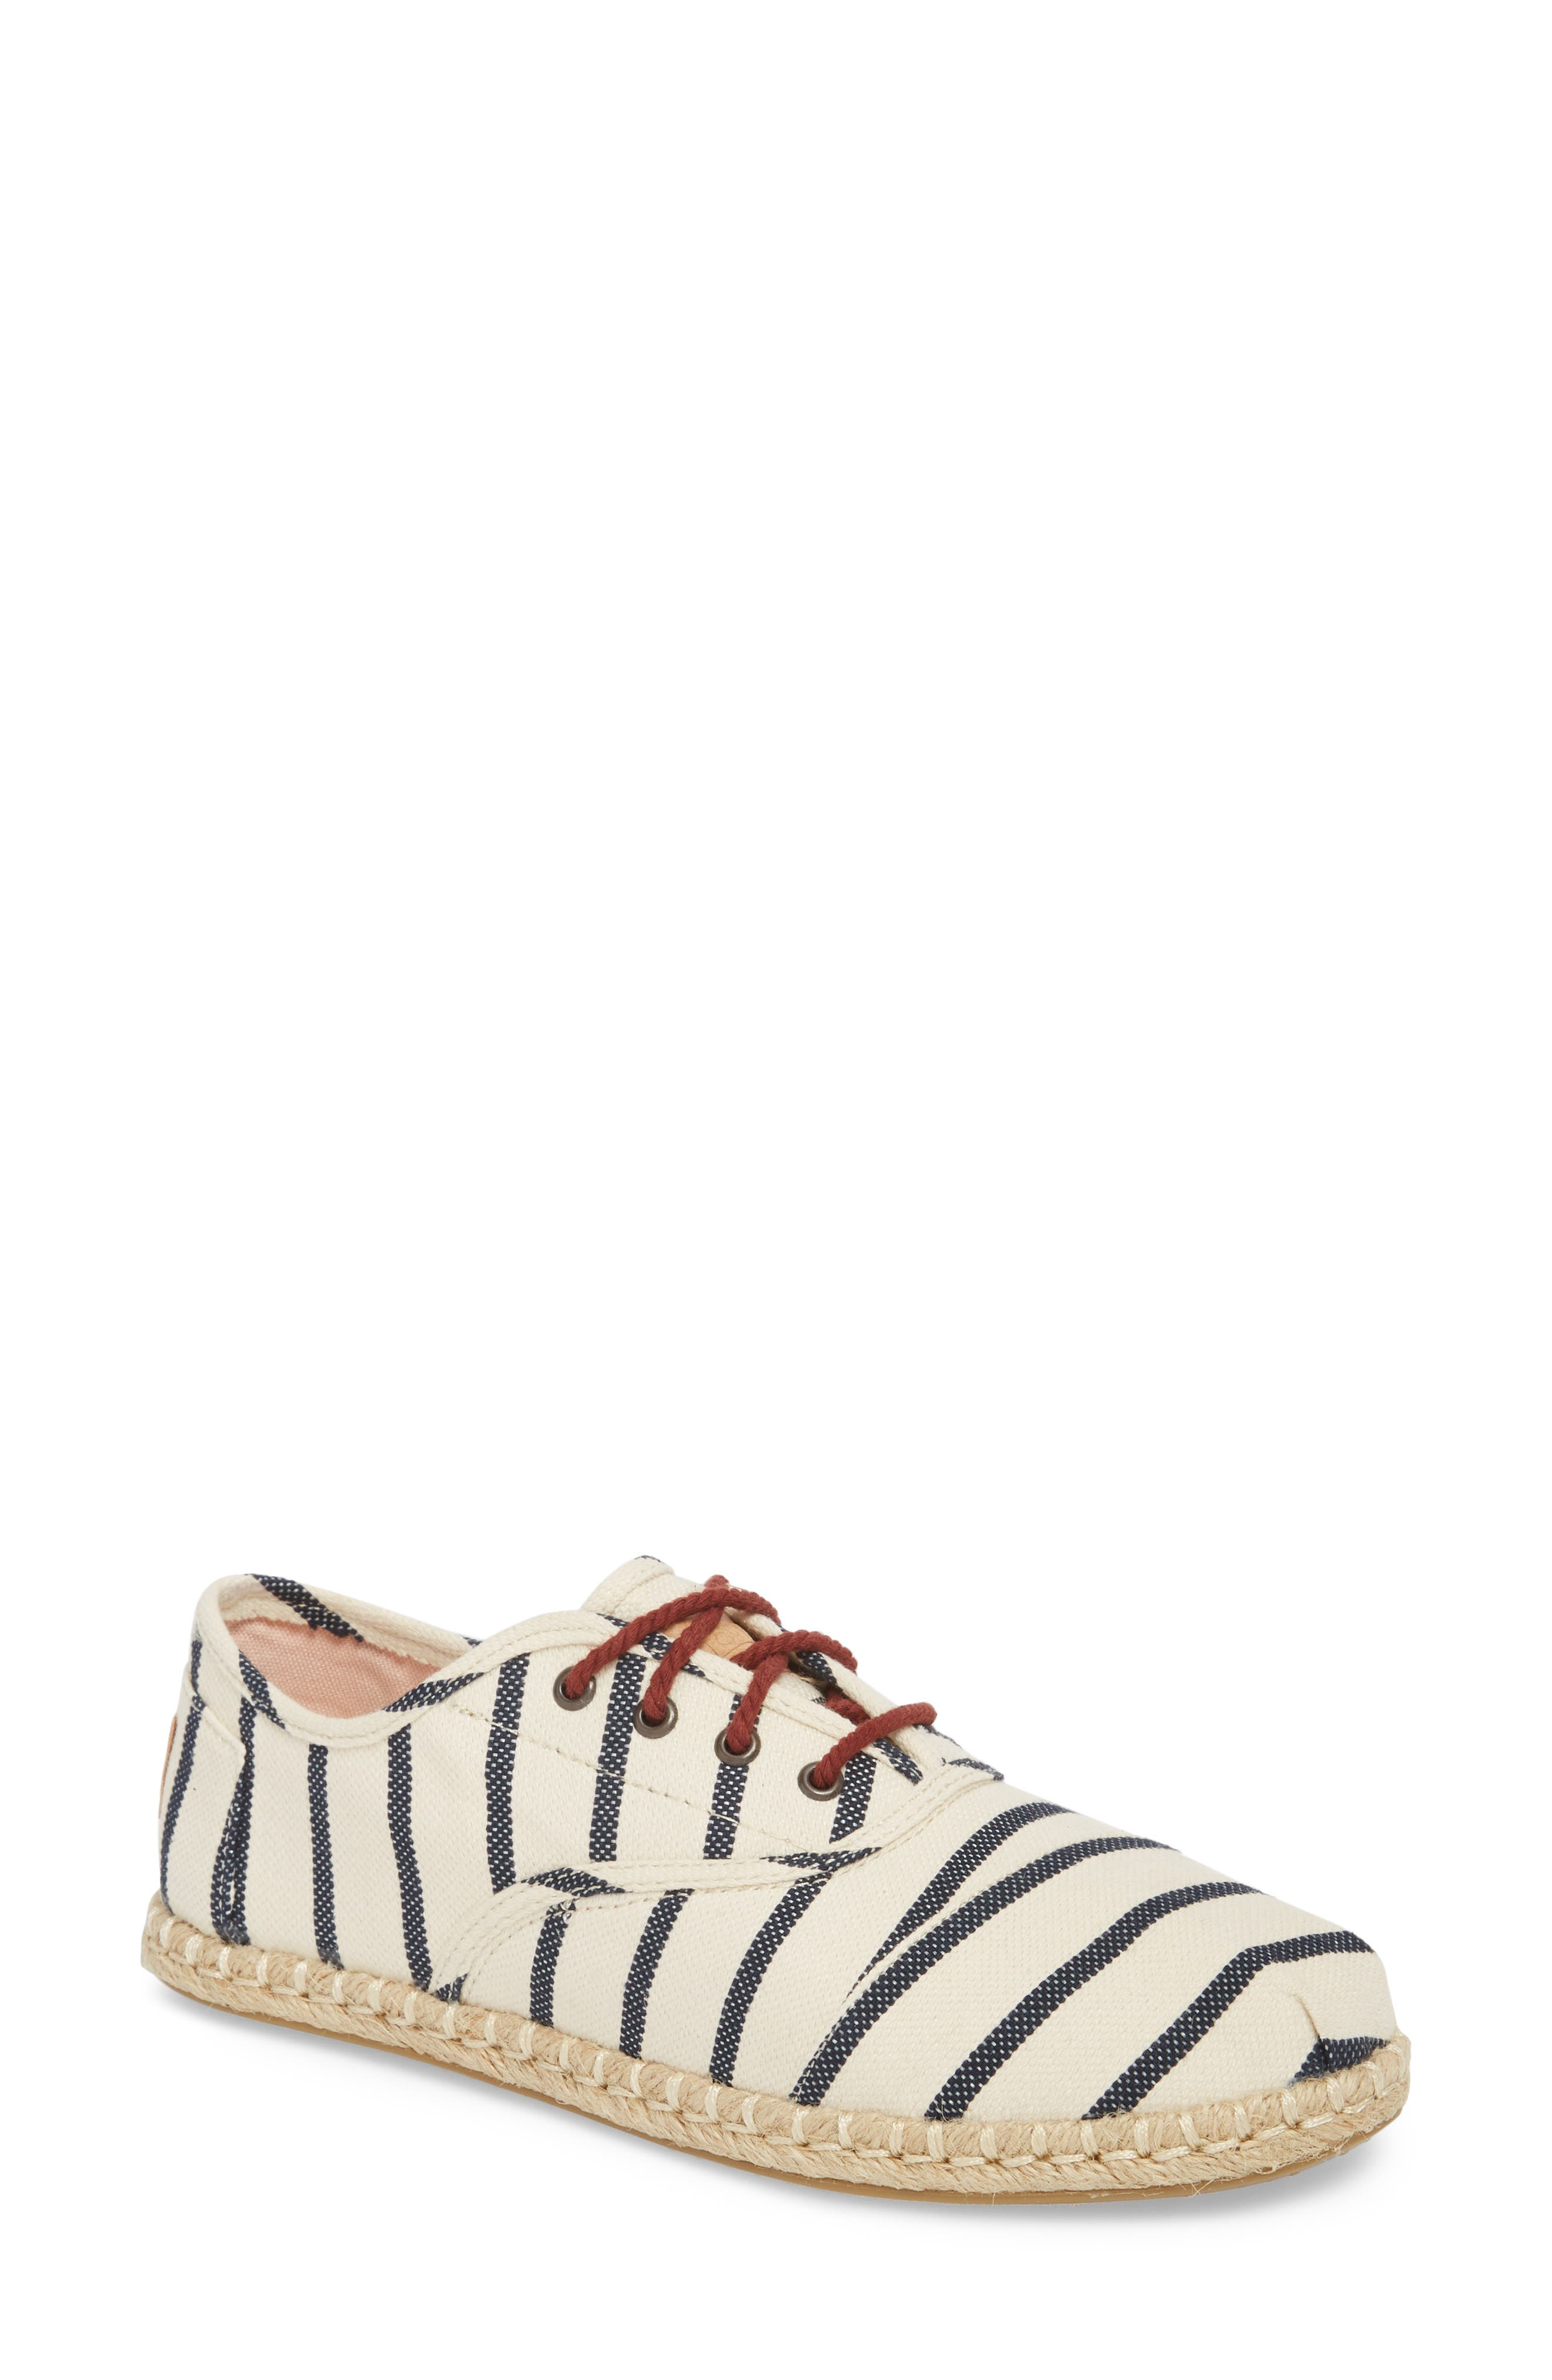 Cordones Sneaker,                             Main thumbnail 1, color,                             Natural Stripe Woven